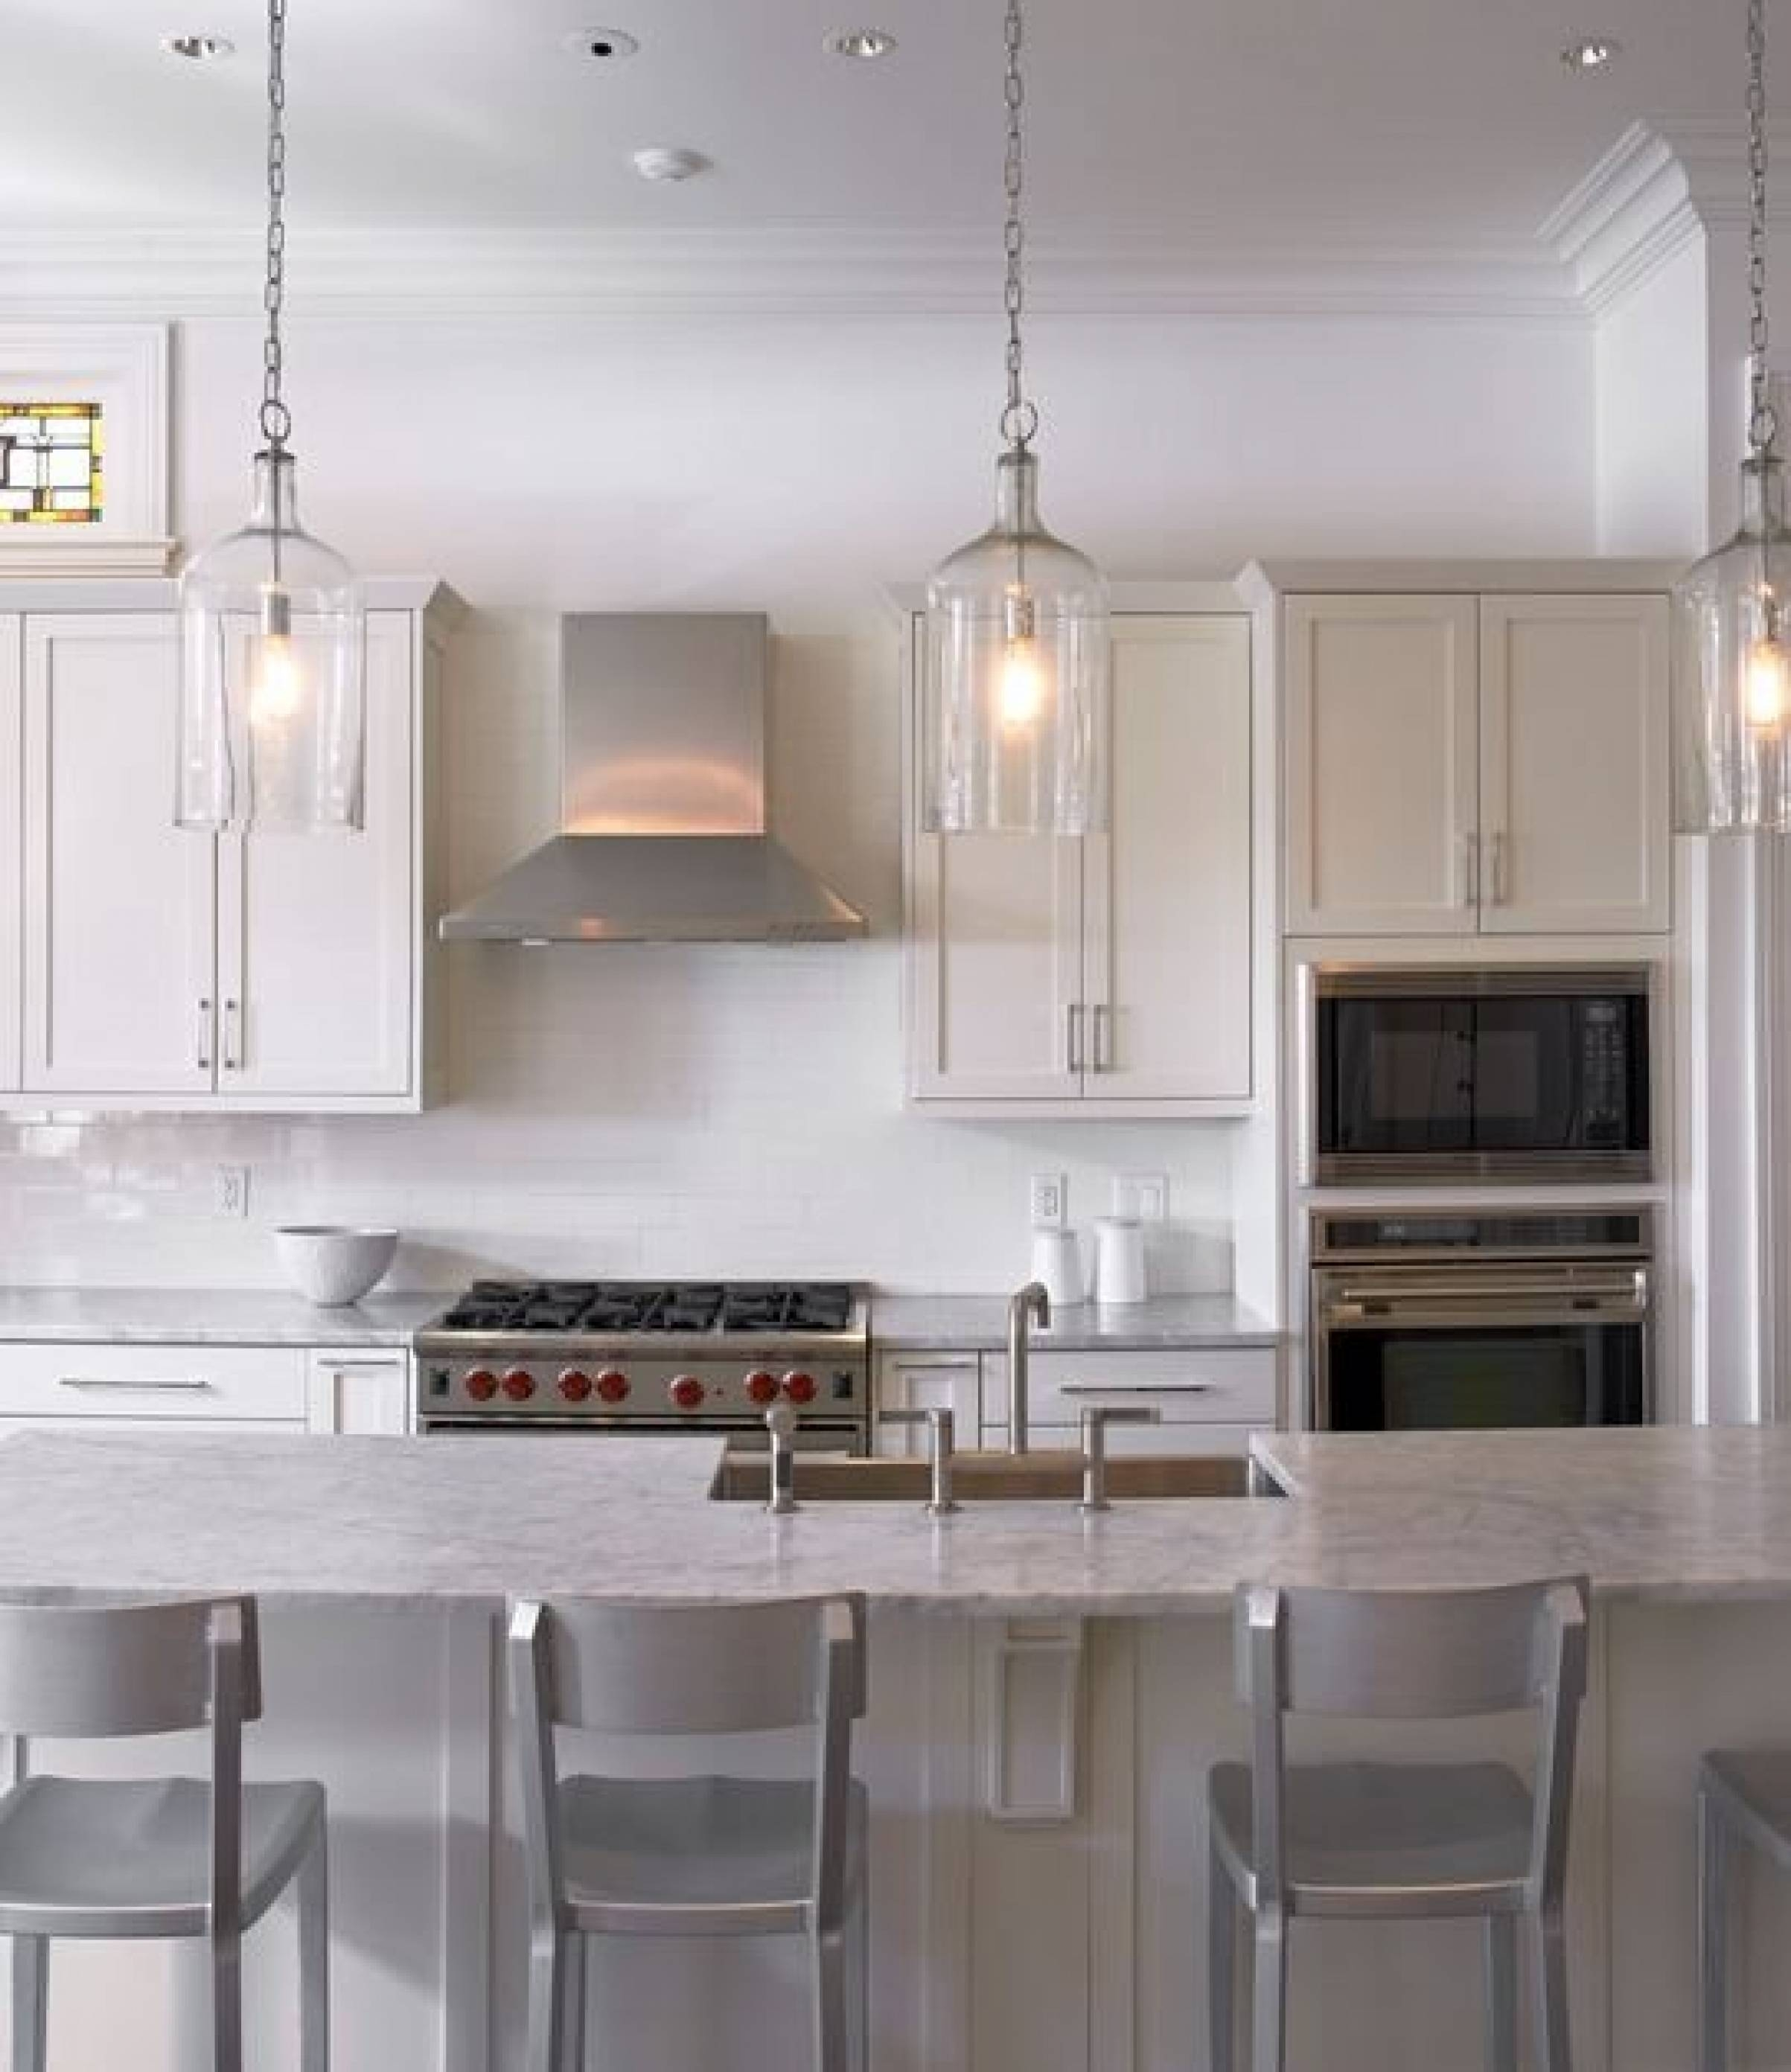 Kitchen : Glass Kitchen Pendants Copper Pendant Light Hanging throughout Island Pendant Light Fixtures (Image 6 of 15)